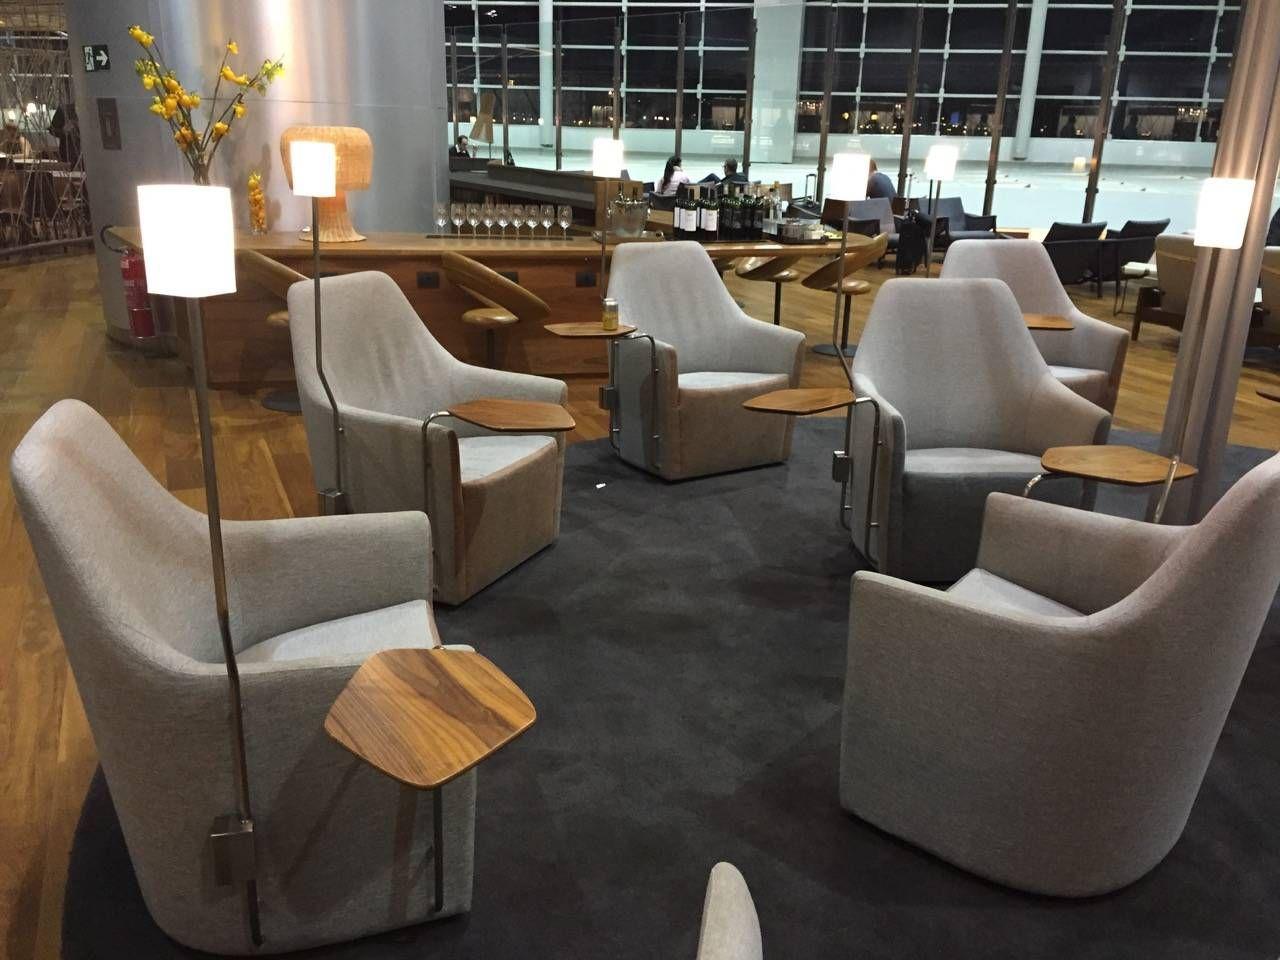 Star Alliance Lounge GRU-023